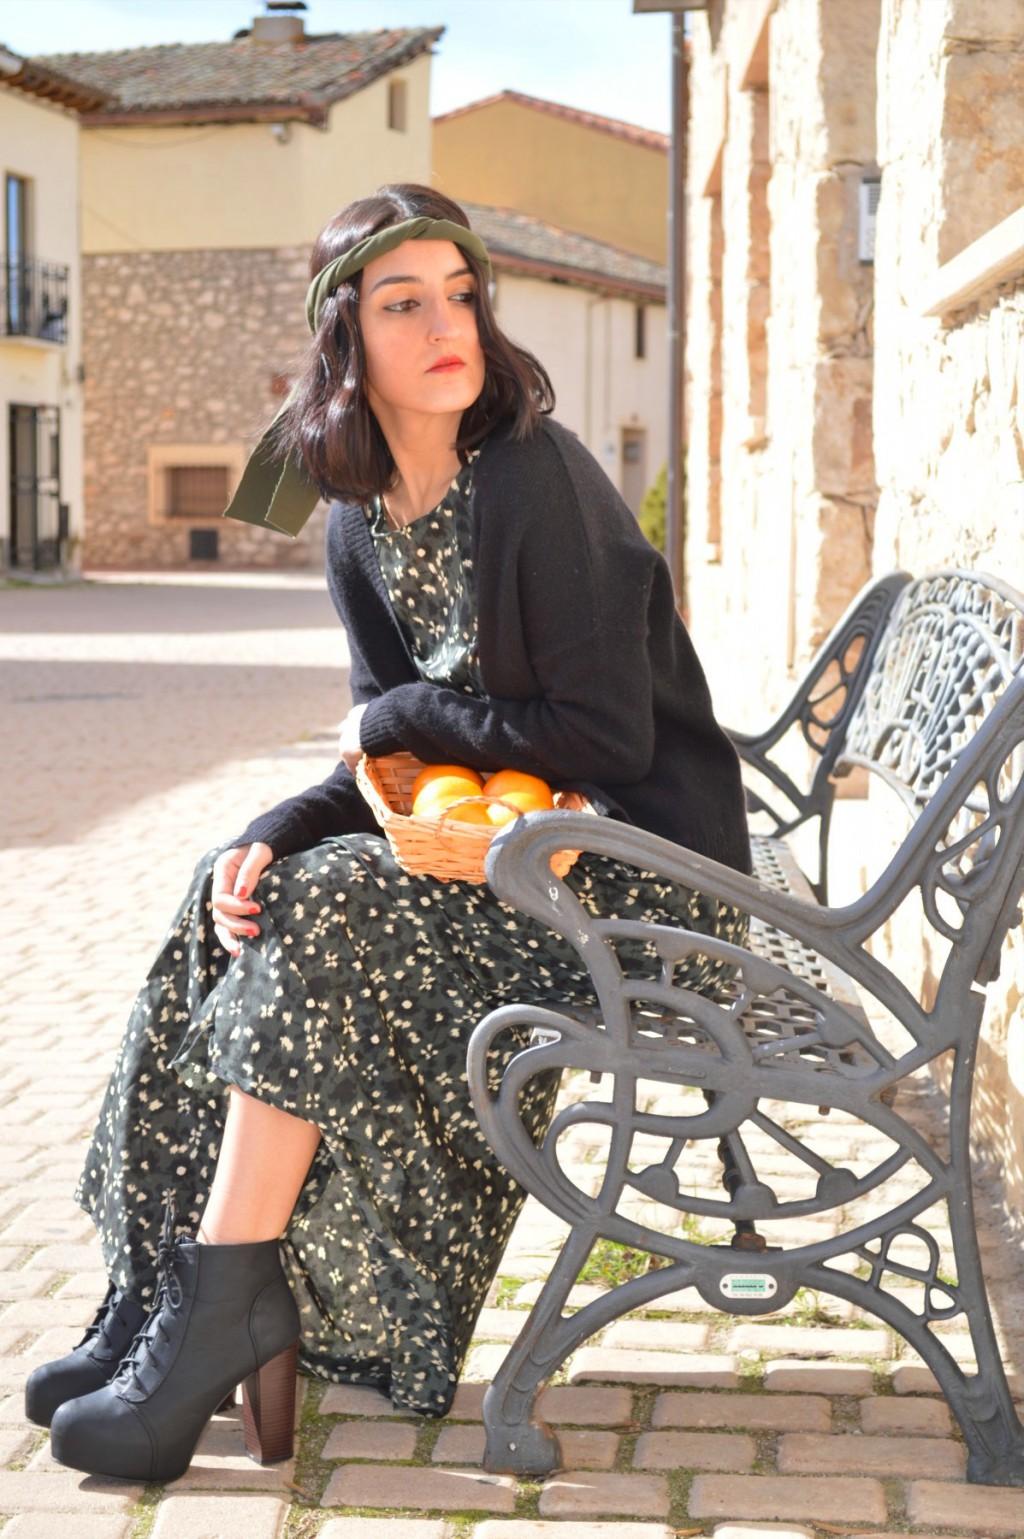 Vestido / dress: Mango Chaqueta / jacket: Bershka Botas / boots: H&M Reloj / watch: Sfera